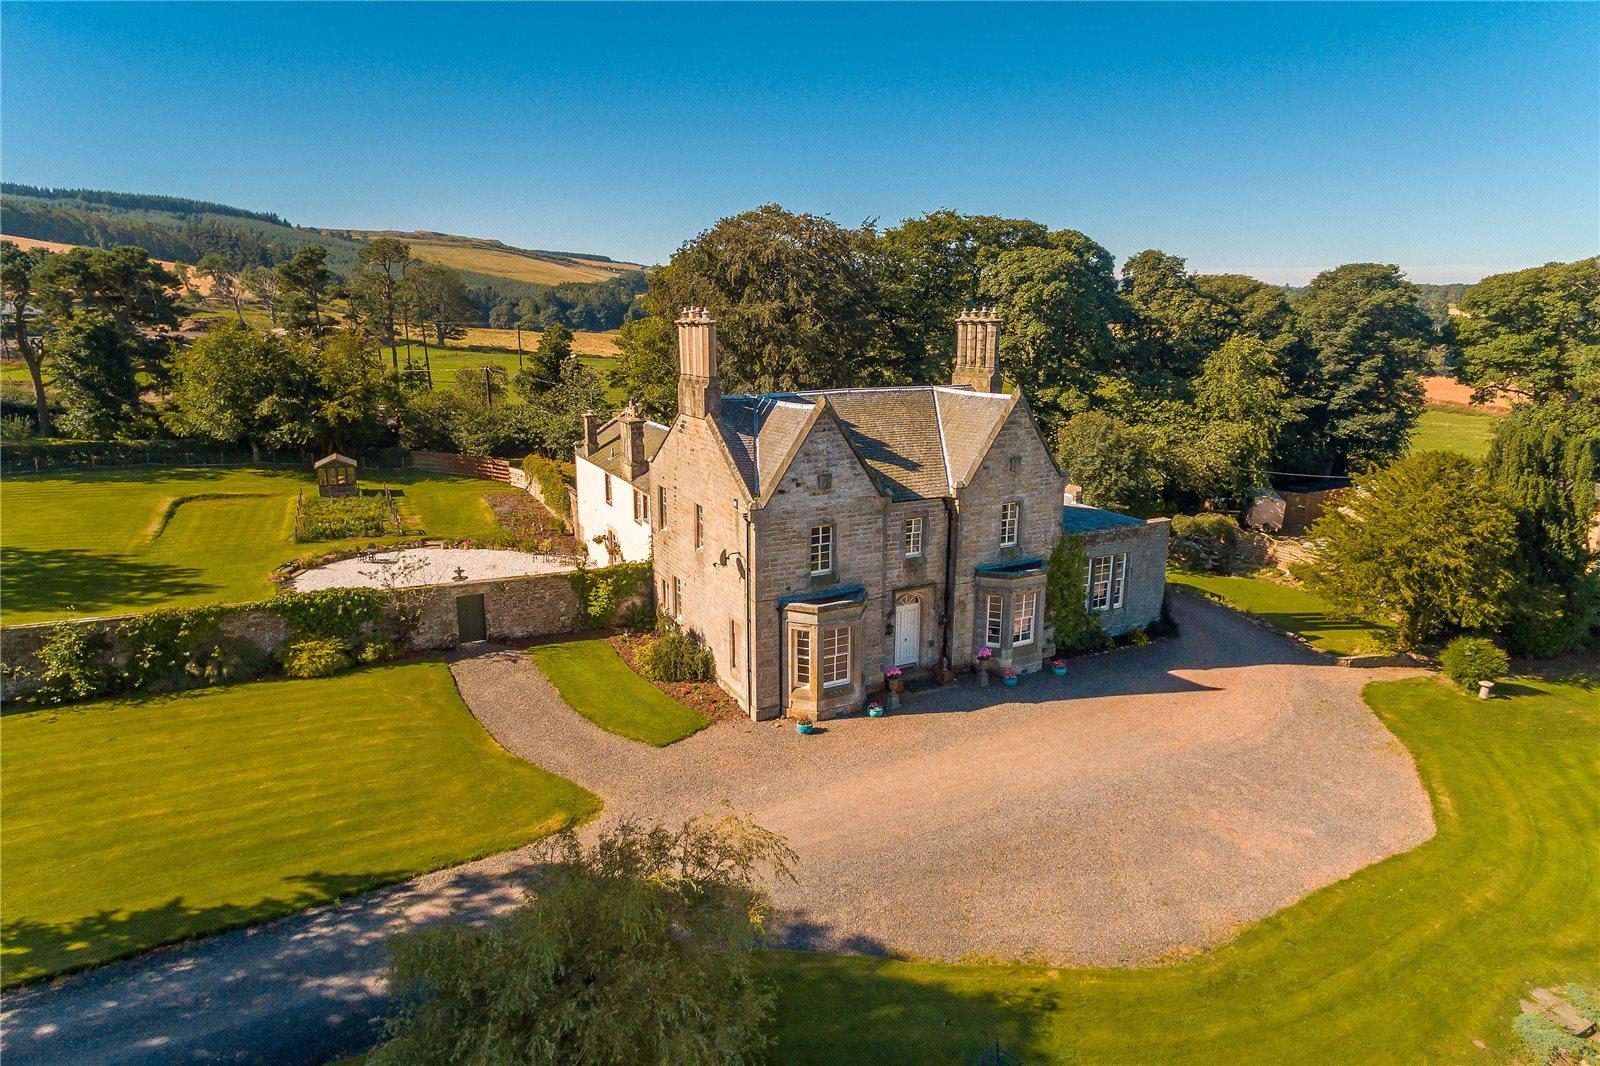 Single Family Home for Sale at Humbie, East Lothian, EH36 East Lothian, Scotland